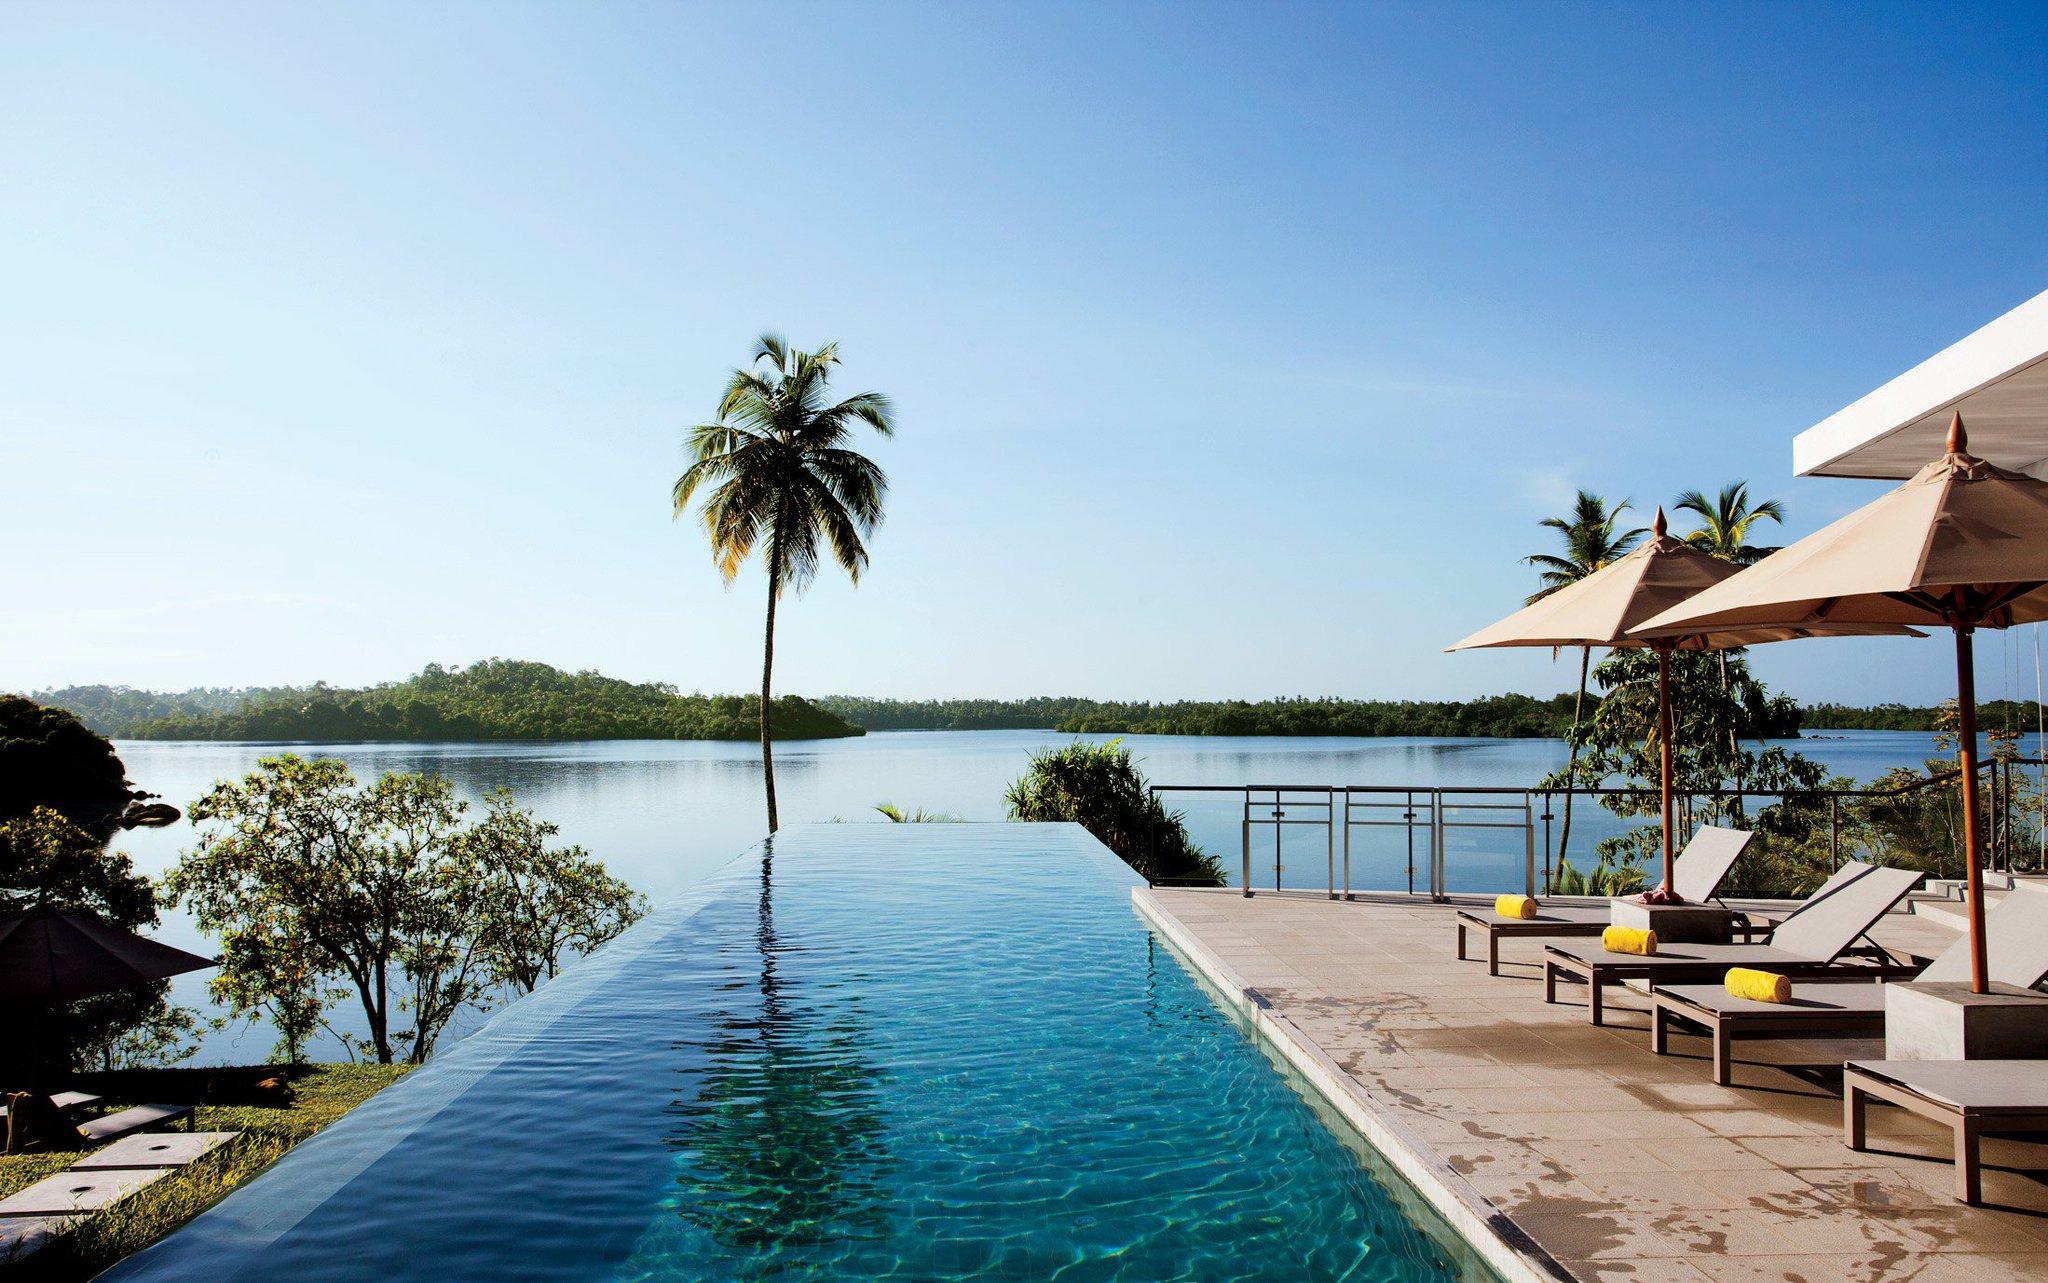 Why you should travel to Sri Lanka next https://t.co/an0UVNKl1Y https://t.co/syaTkRoBXB